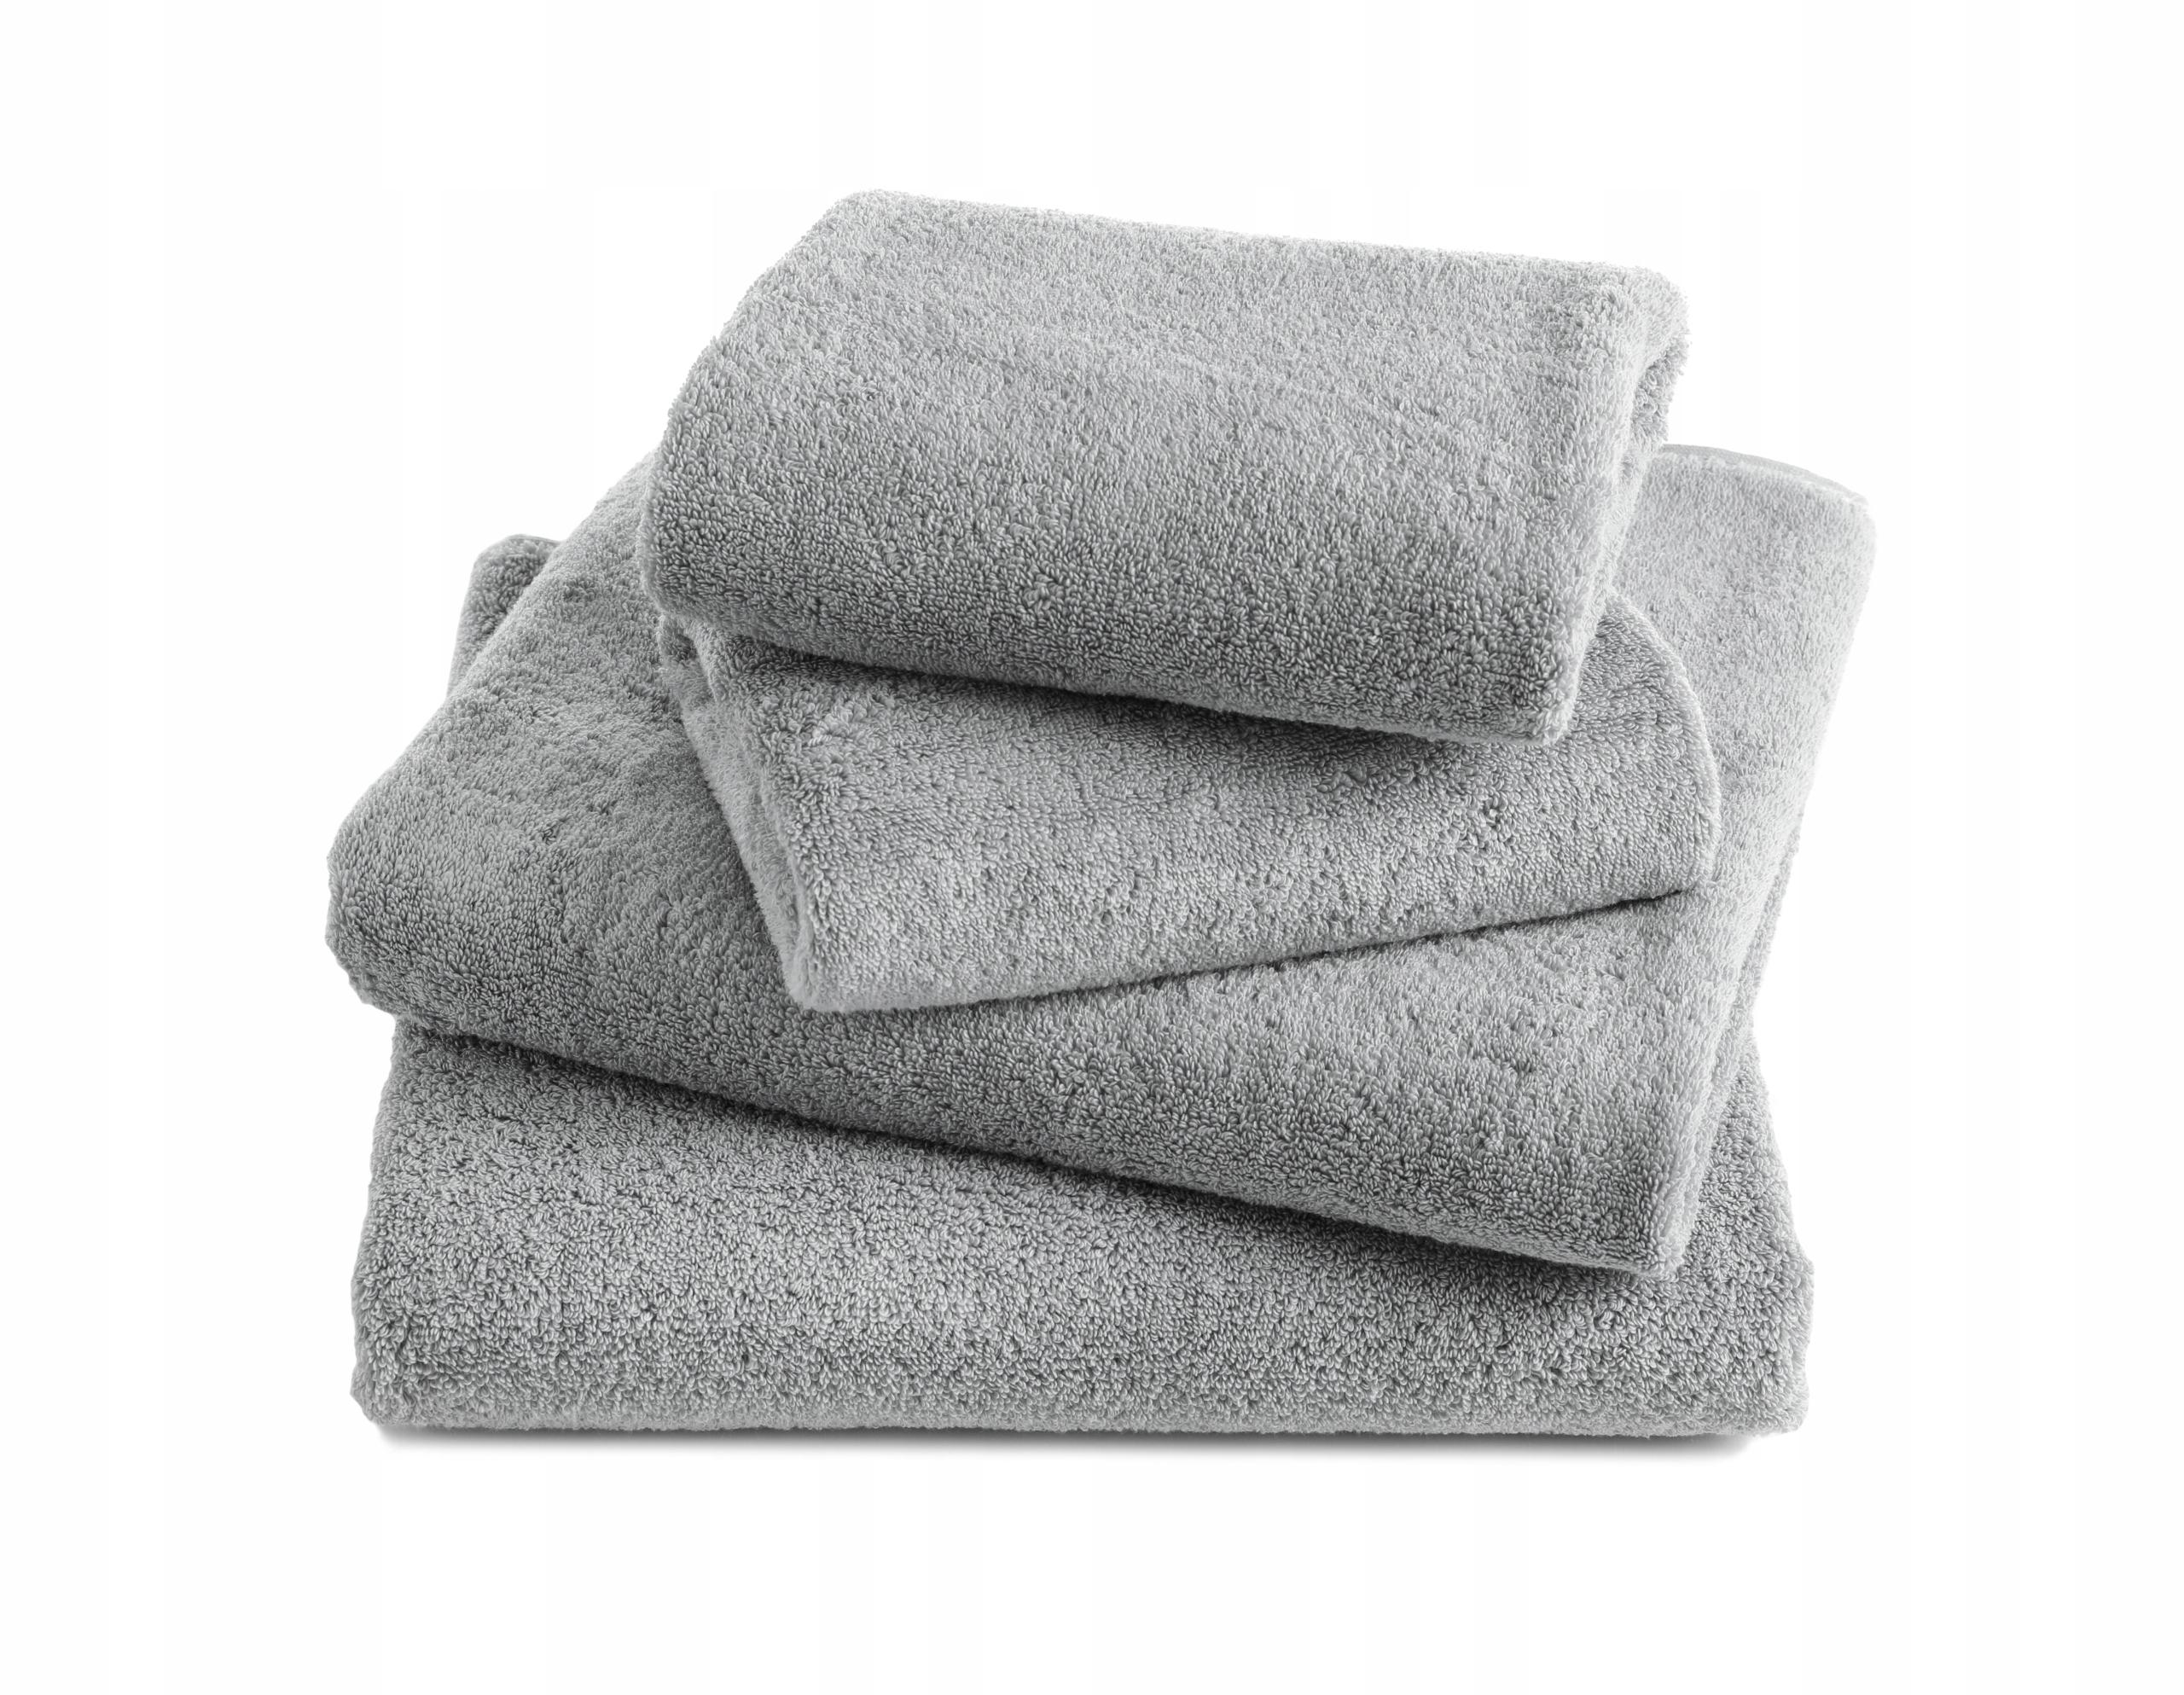 4 SET OF TOWELS 2x 70x140 - 2x 50x100 - 500г